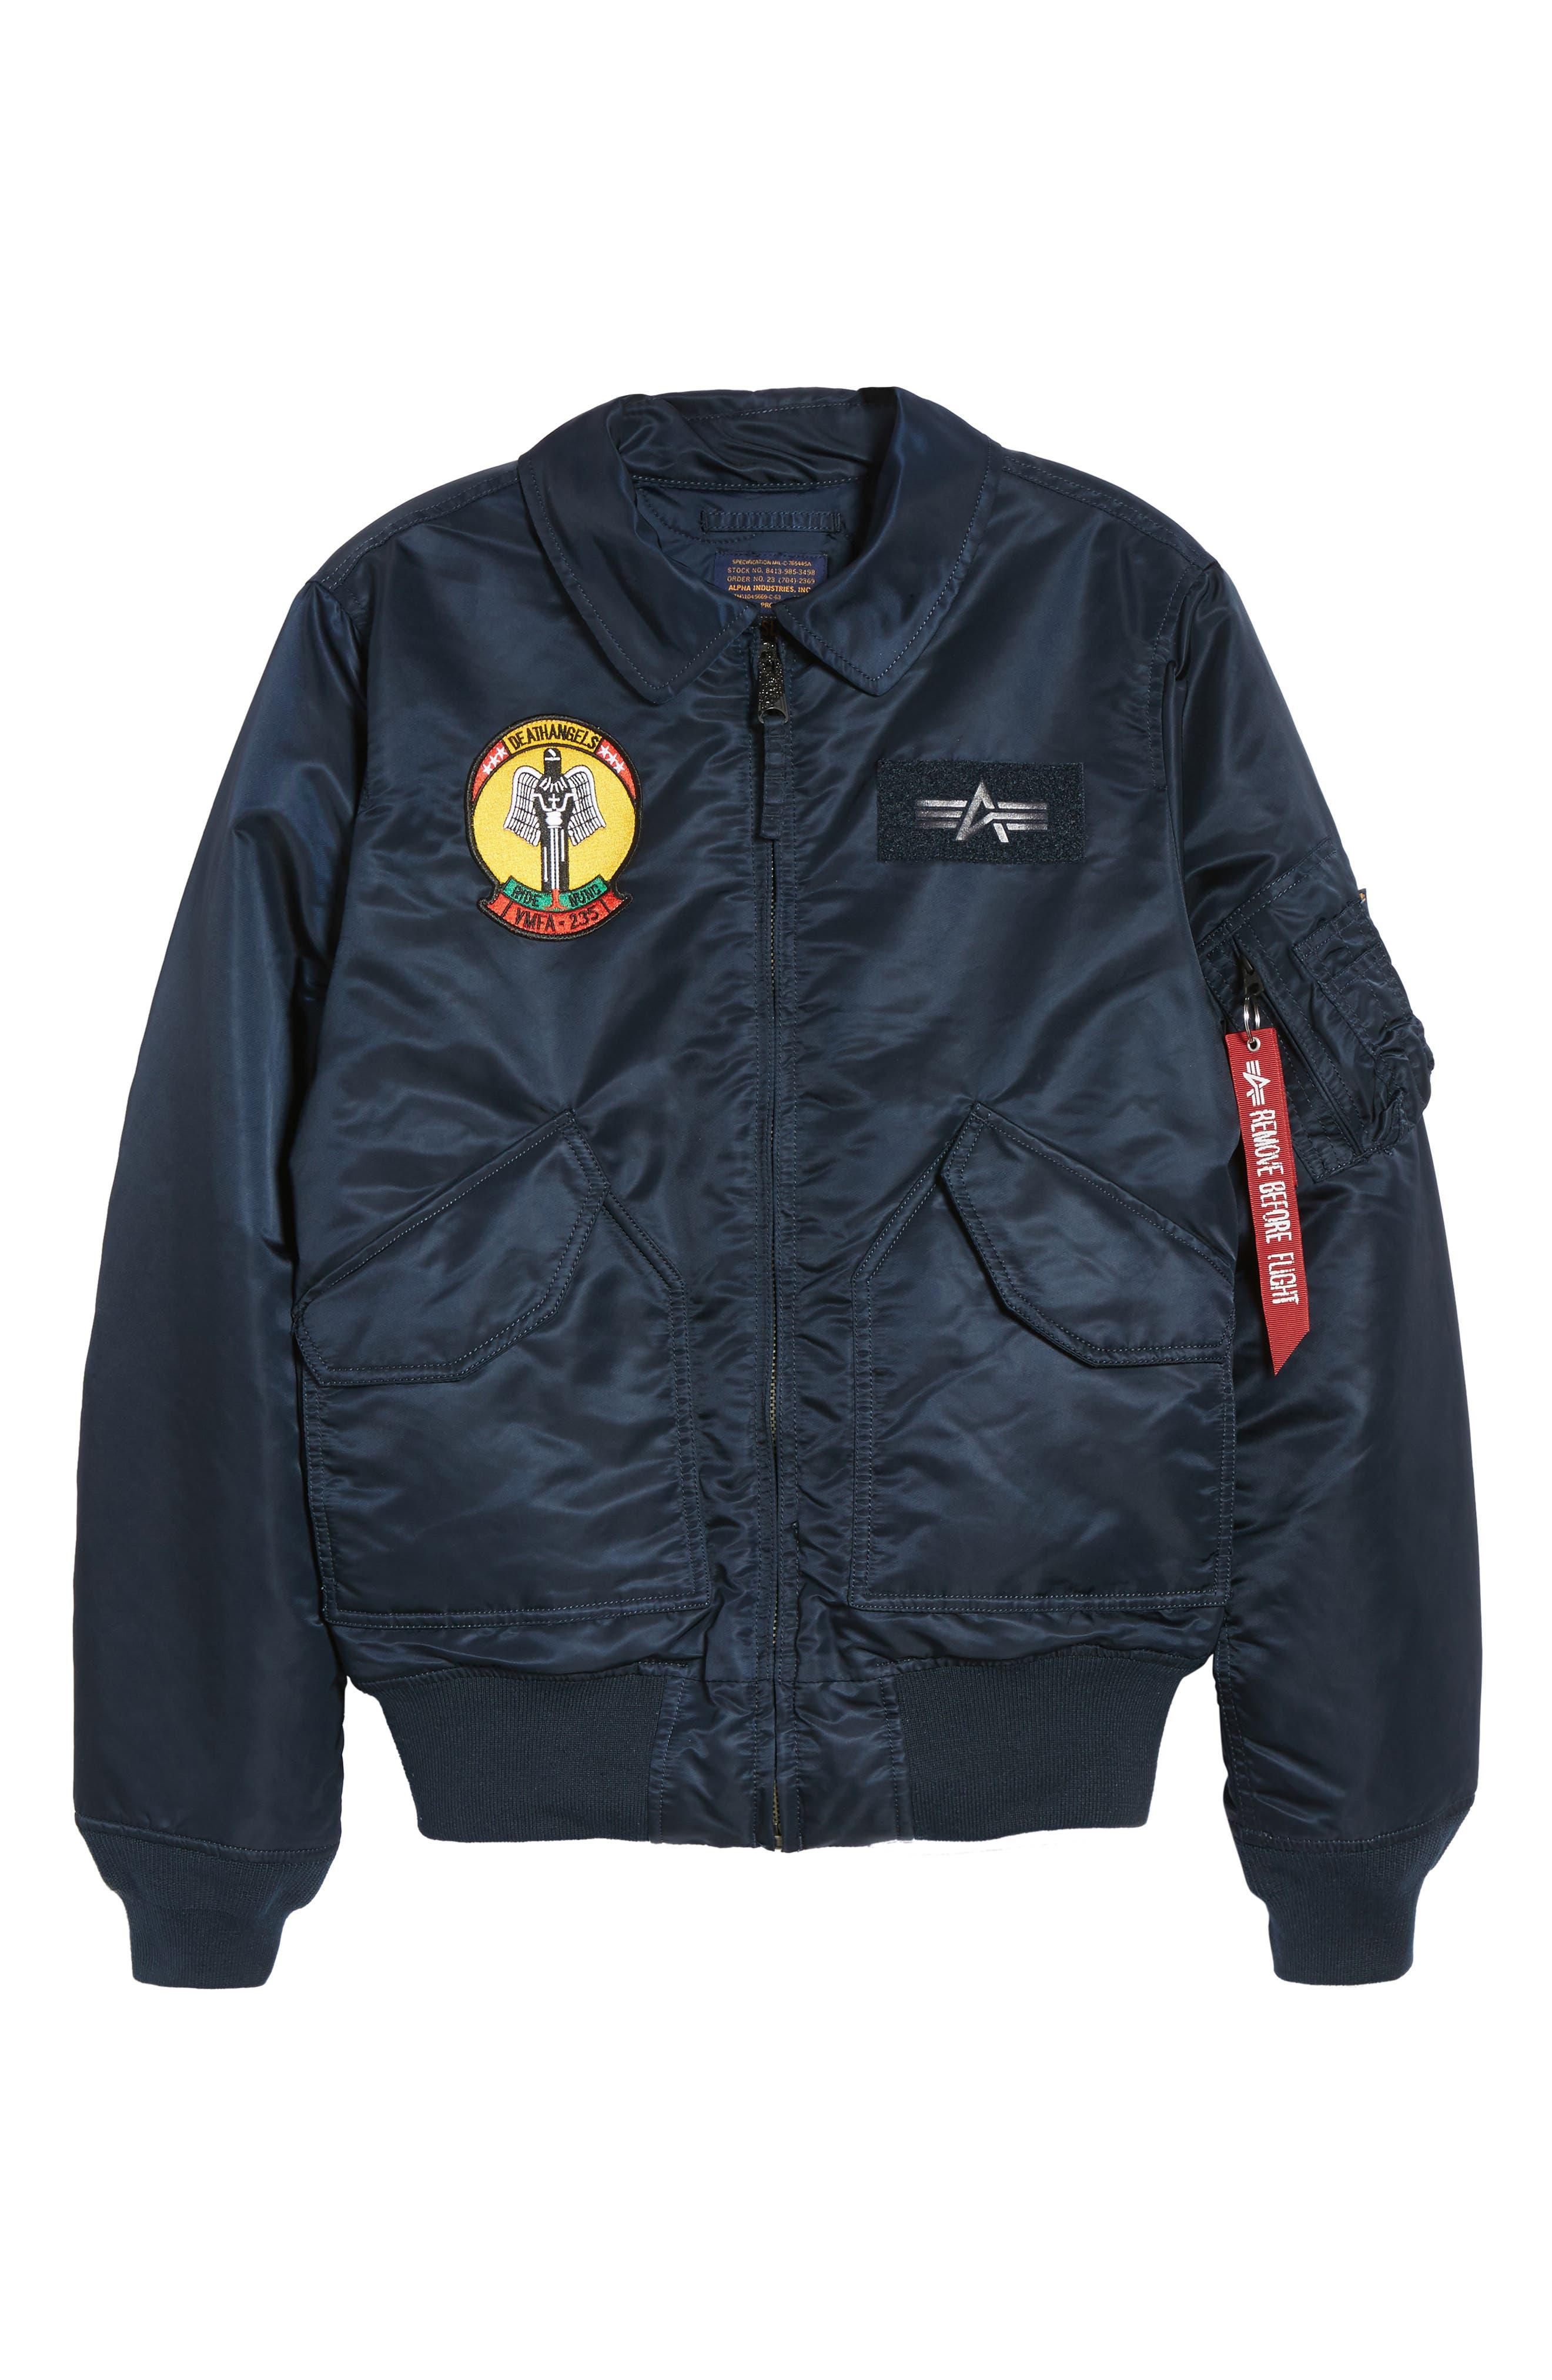 CWO 45/P Storm Cruise Jacket,                             Alternate thumbnail 6, color,                             Replica Blue